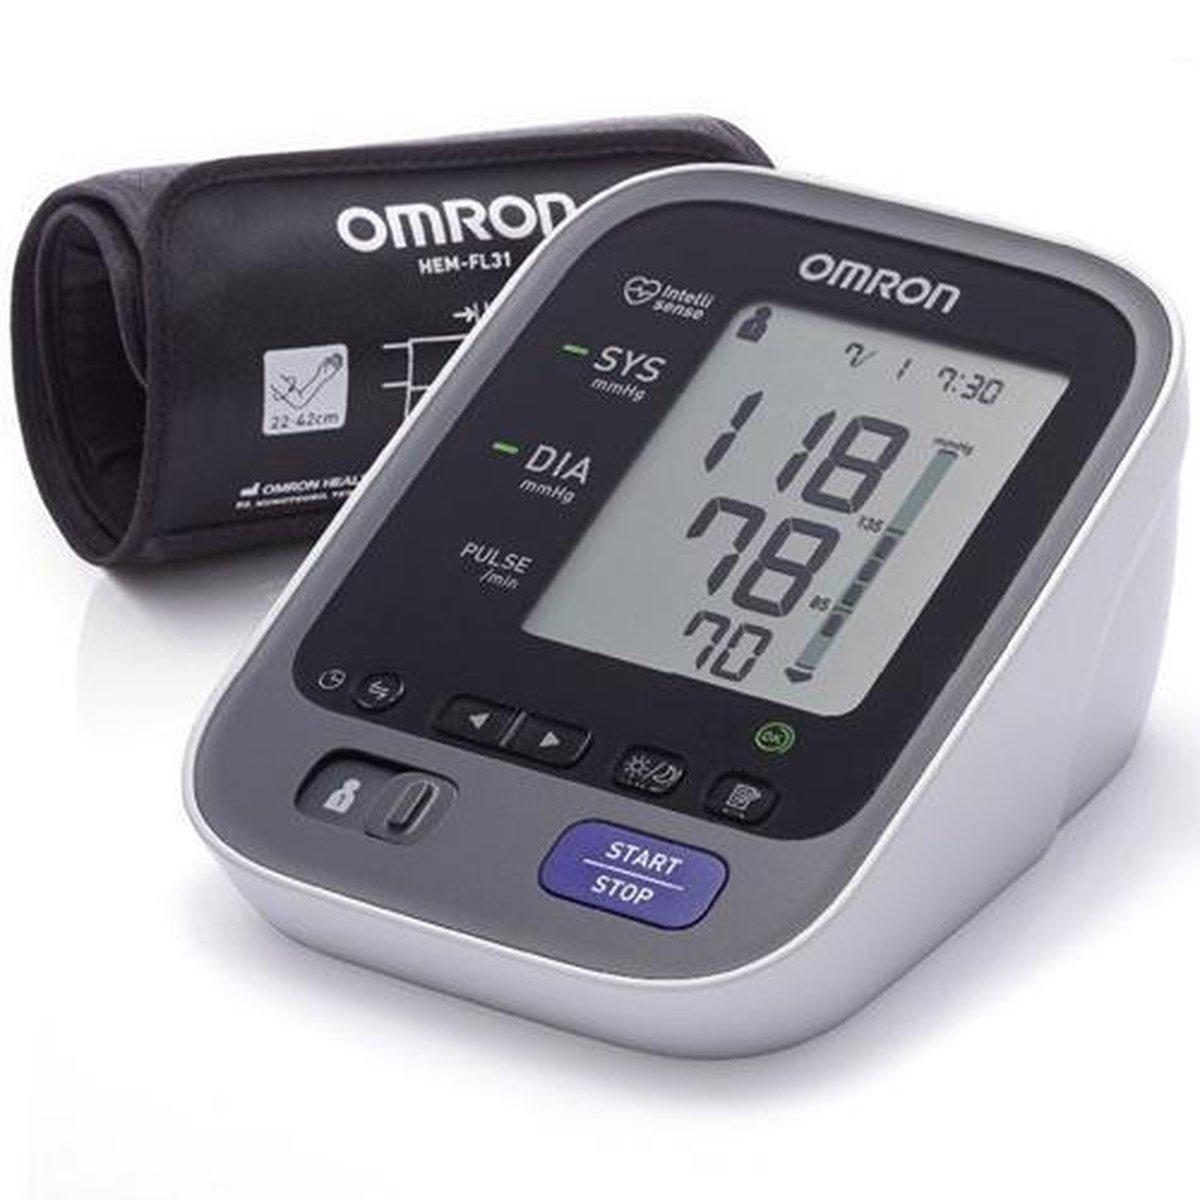 Omron M7 - Bovenarm bloeddrukmeter - Omron